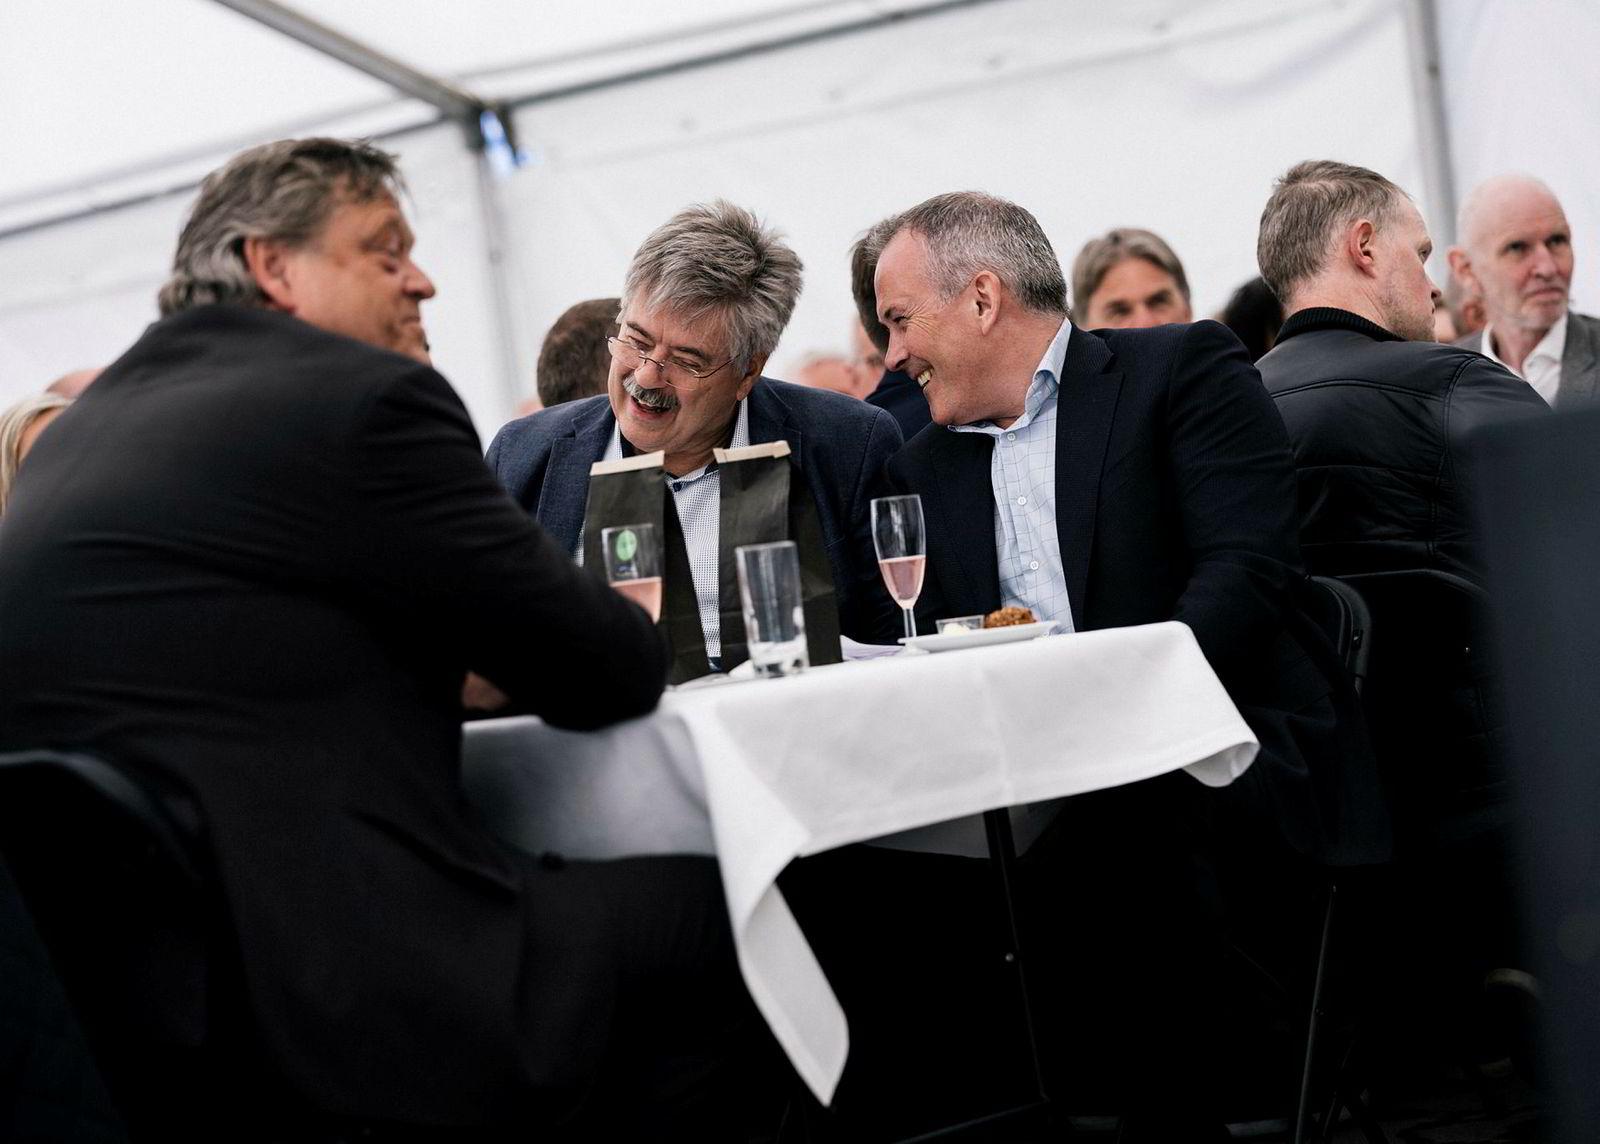 Anbjørn Øglend, til høyre og Jakob Hatteland i midten i god samtale med fiskeriminister Harald Tom Nesvik, til venstre.